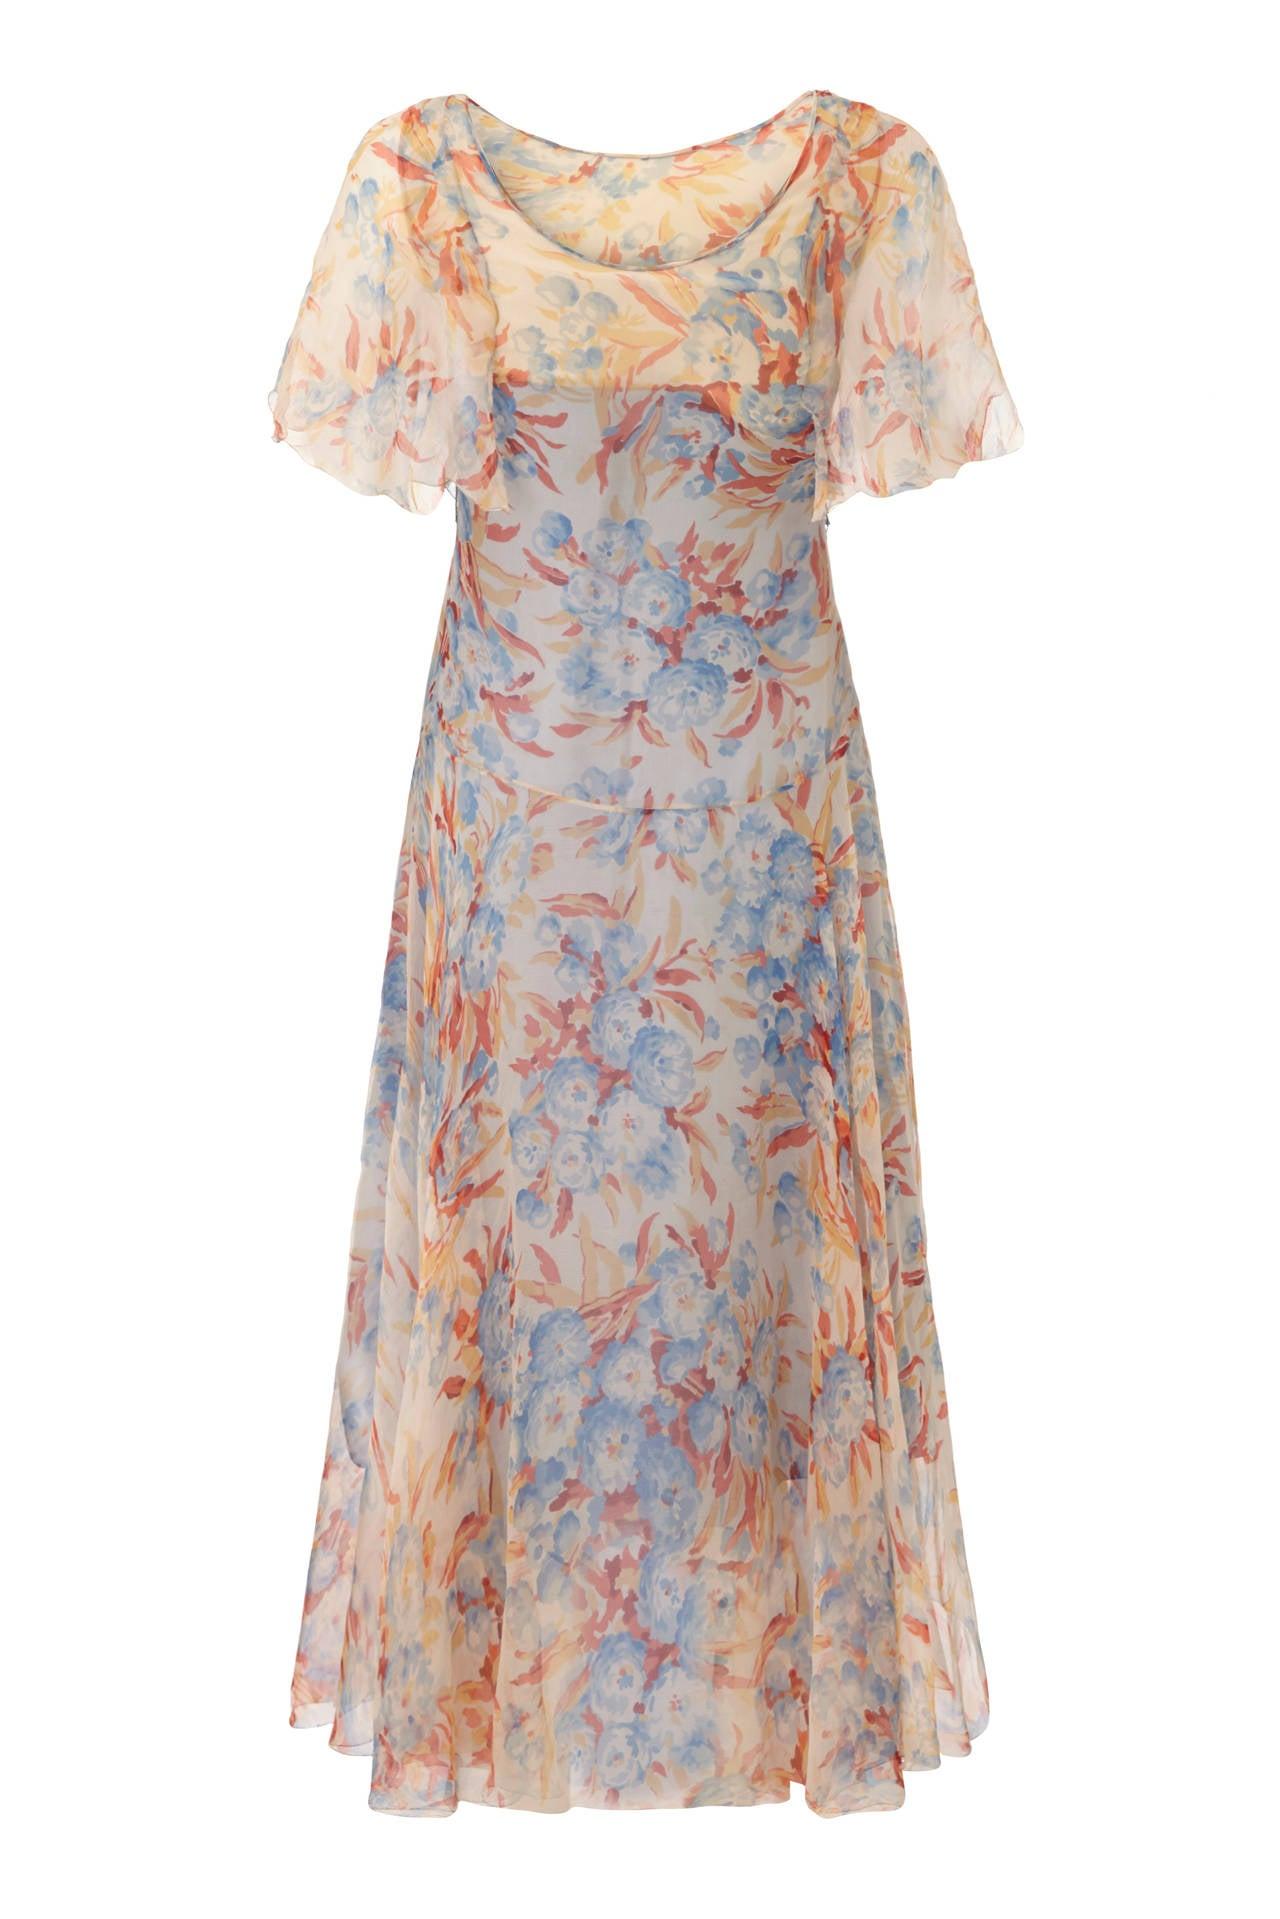 Outstanding 1920s Silk Chiffon Floral Dress 2